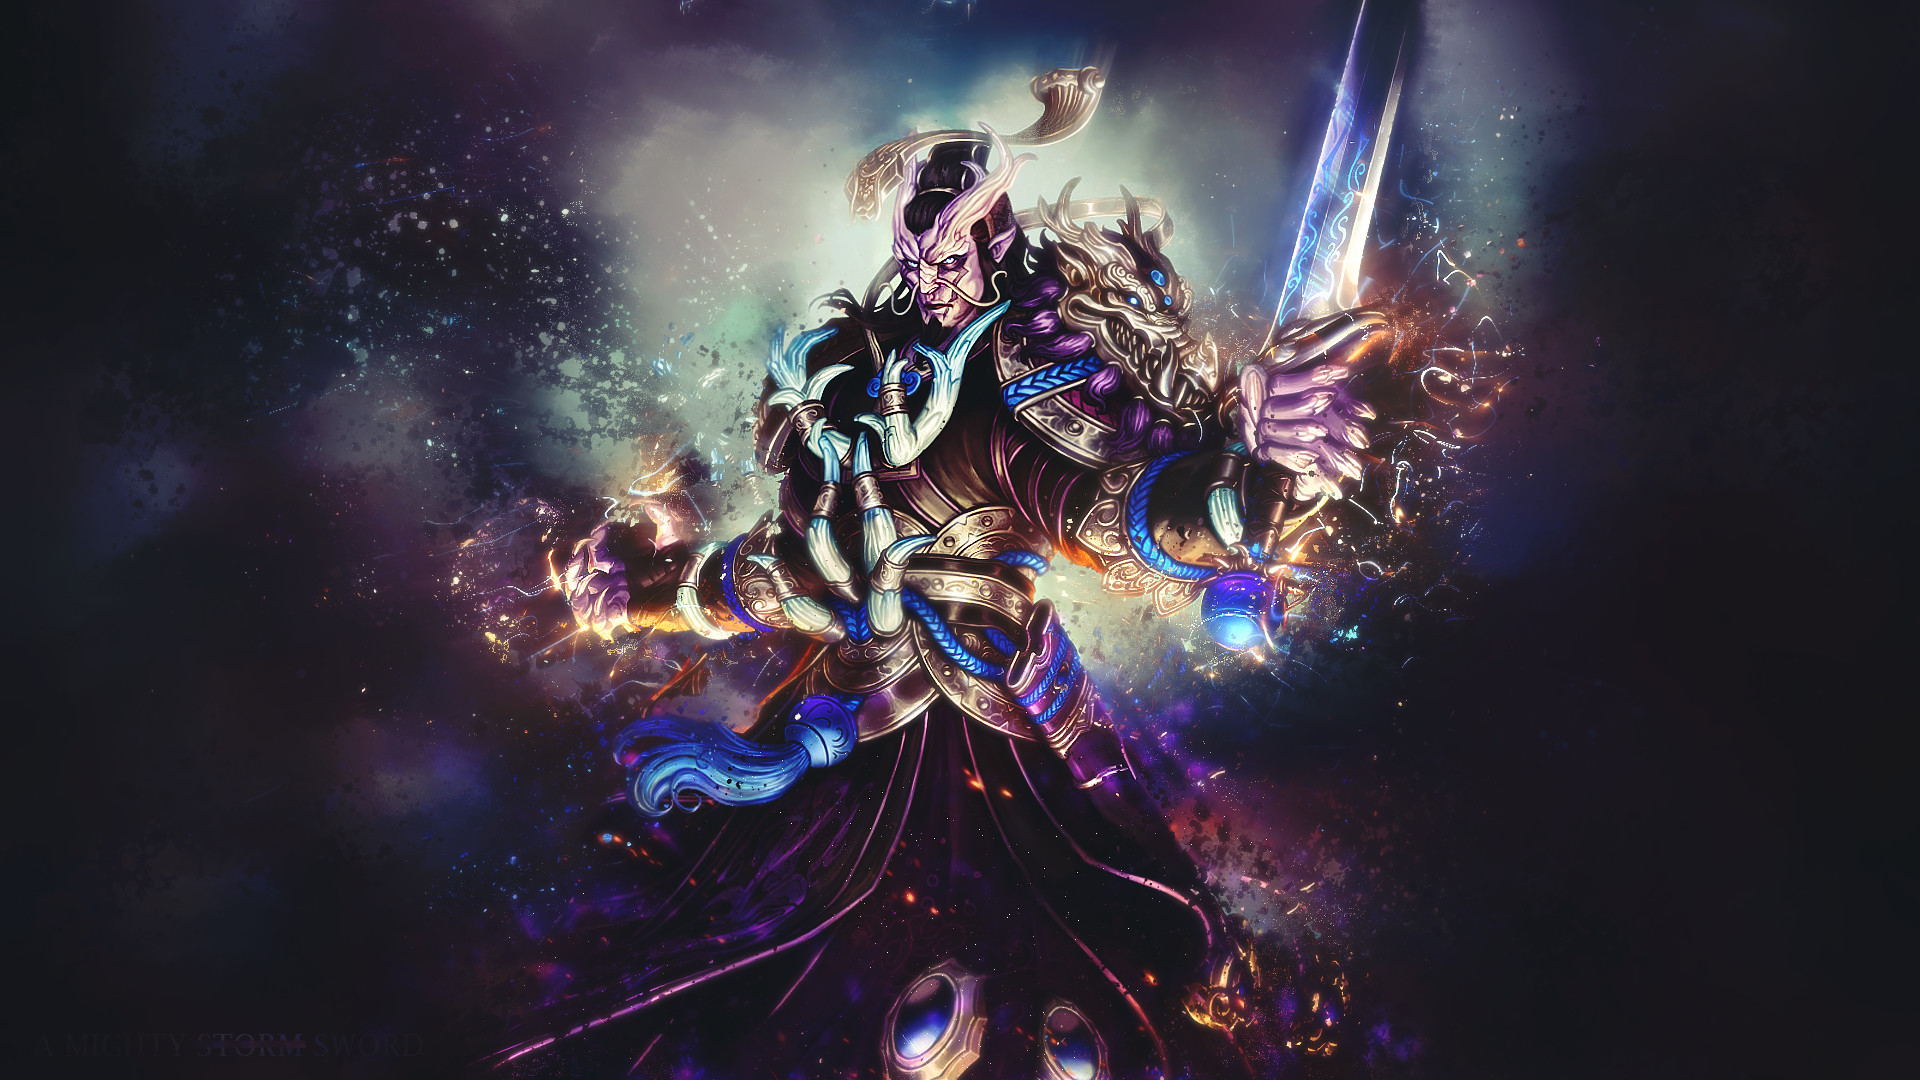 Video Game – Smite Ao Kuang (Smite) Video Game Wallpaper